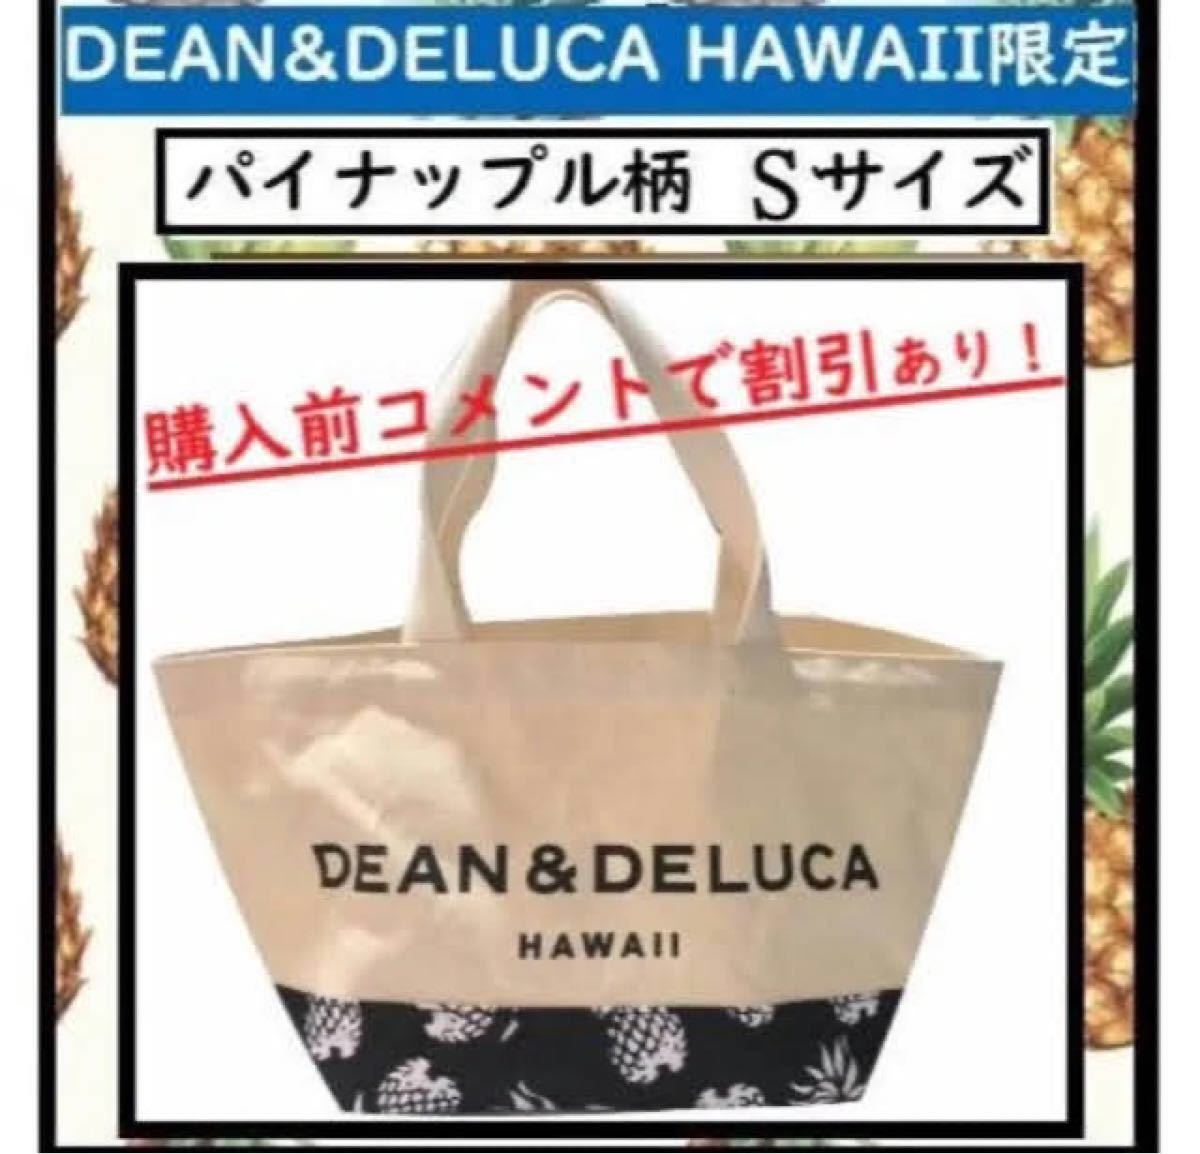 DEAN&DELUCA パイナップル柄 ハワイ限定 トートバッグ S トートバッグ DEAN&DELUCA エコバッグ